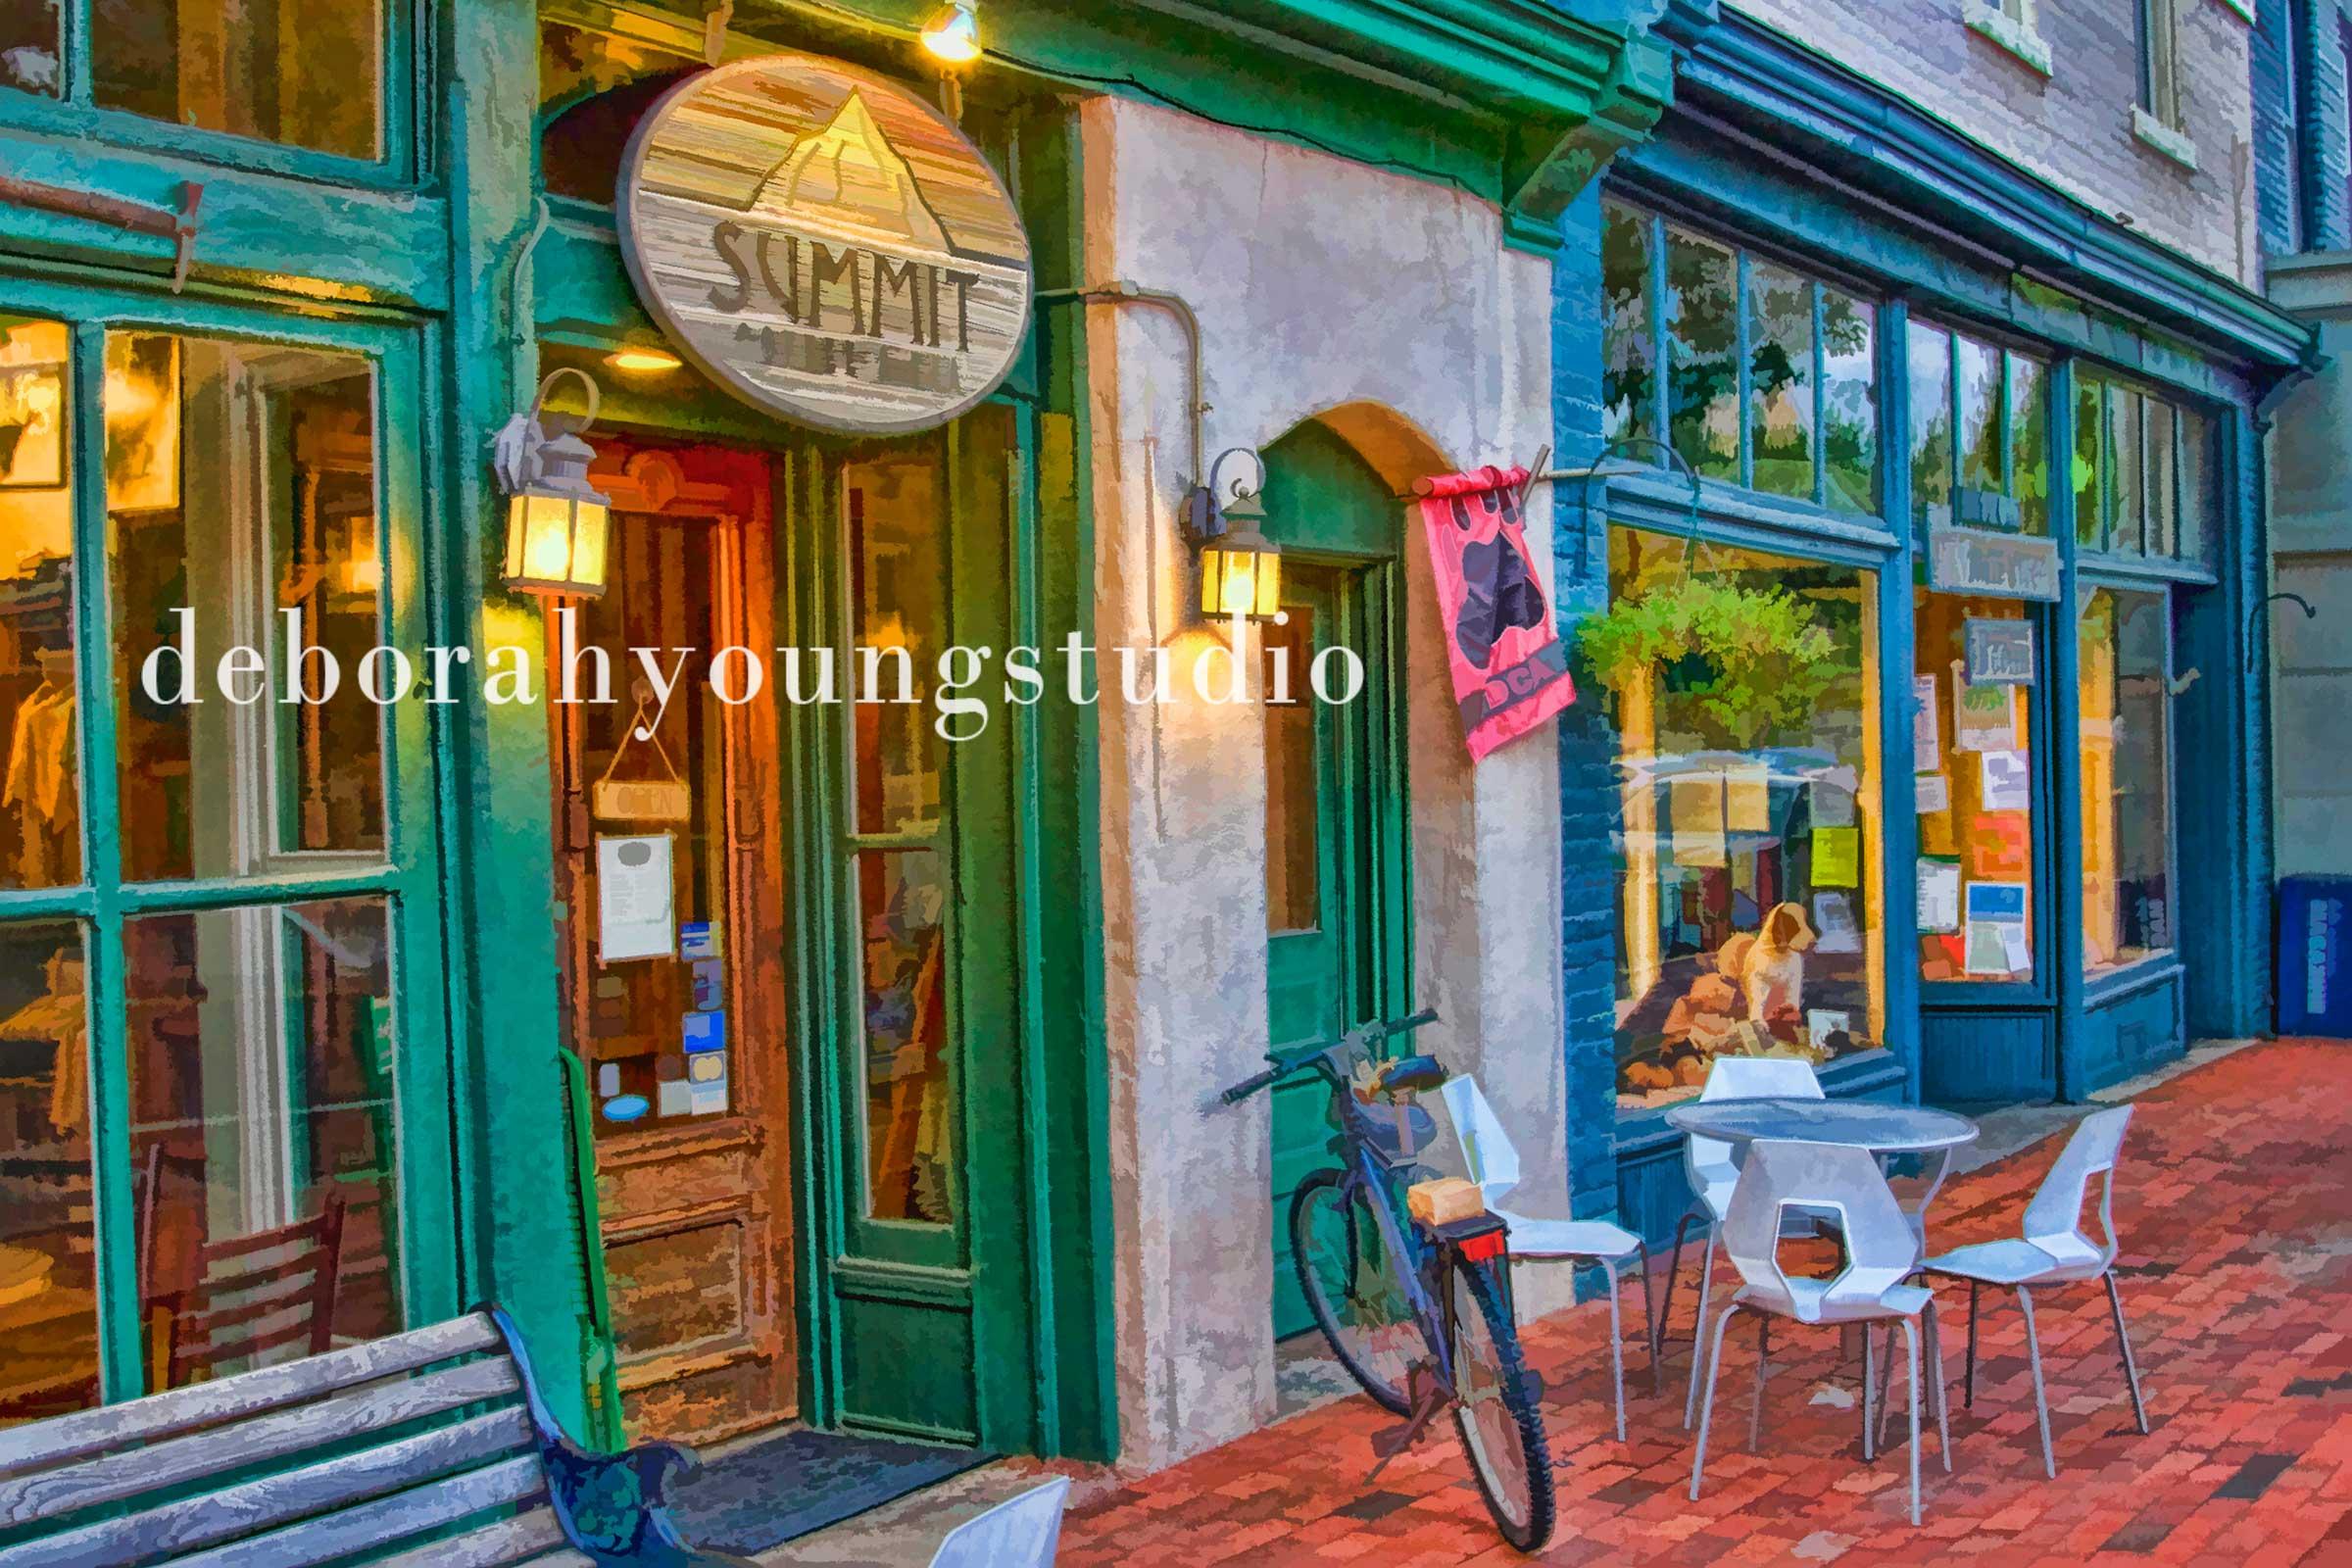 Deborah Young Studio creative art - Summit Coffee Shop